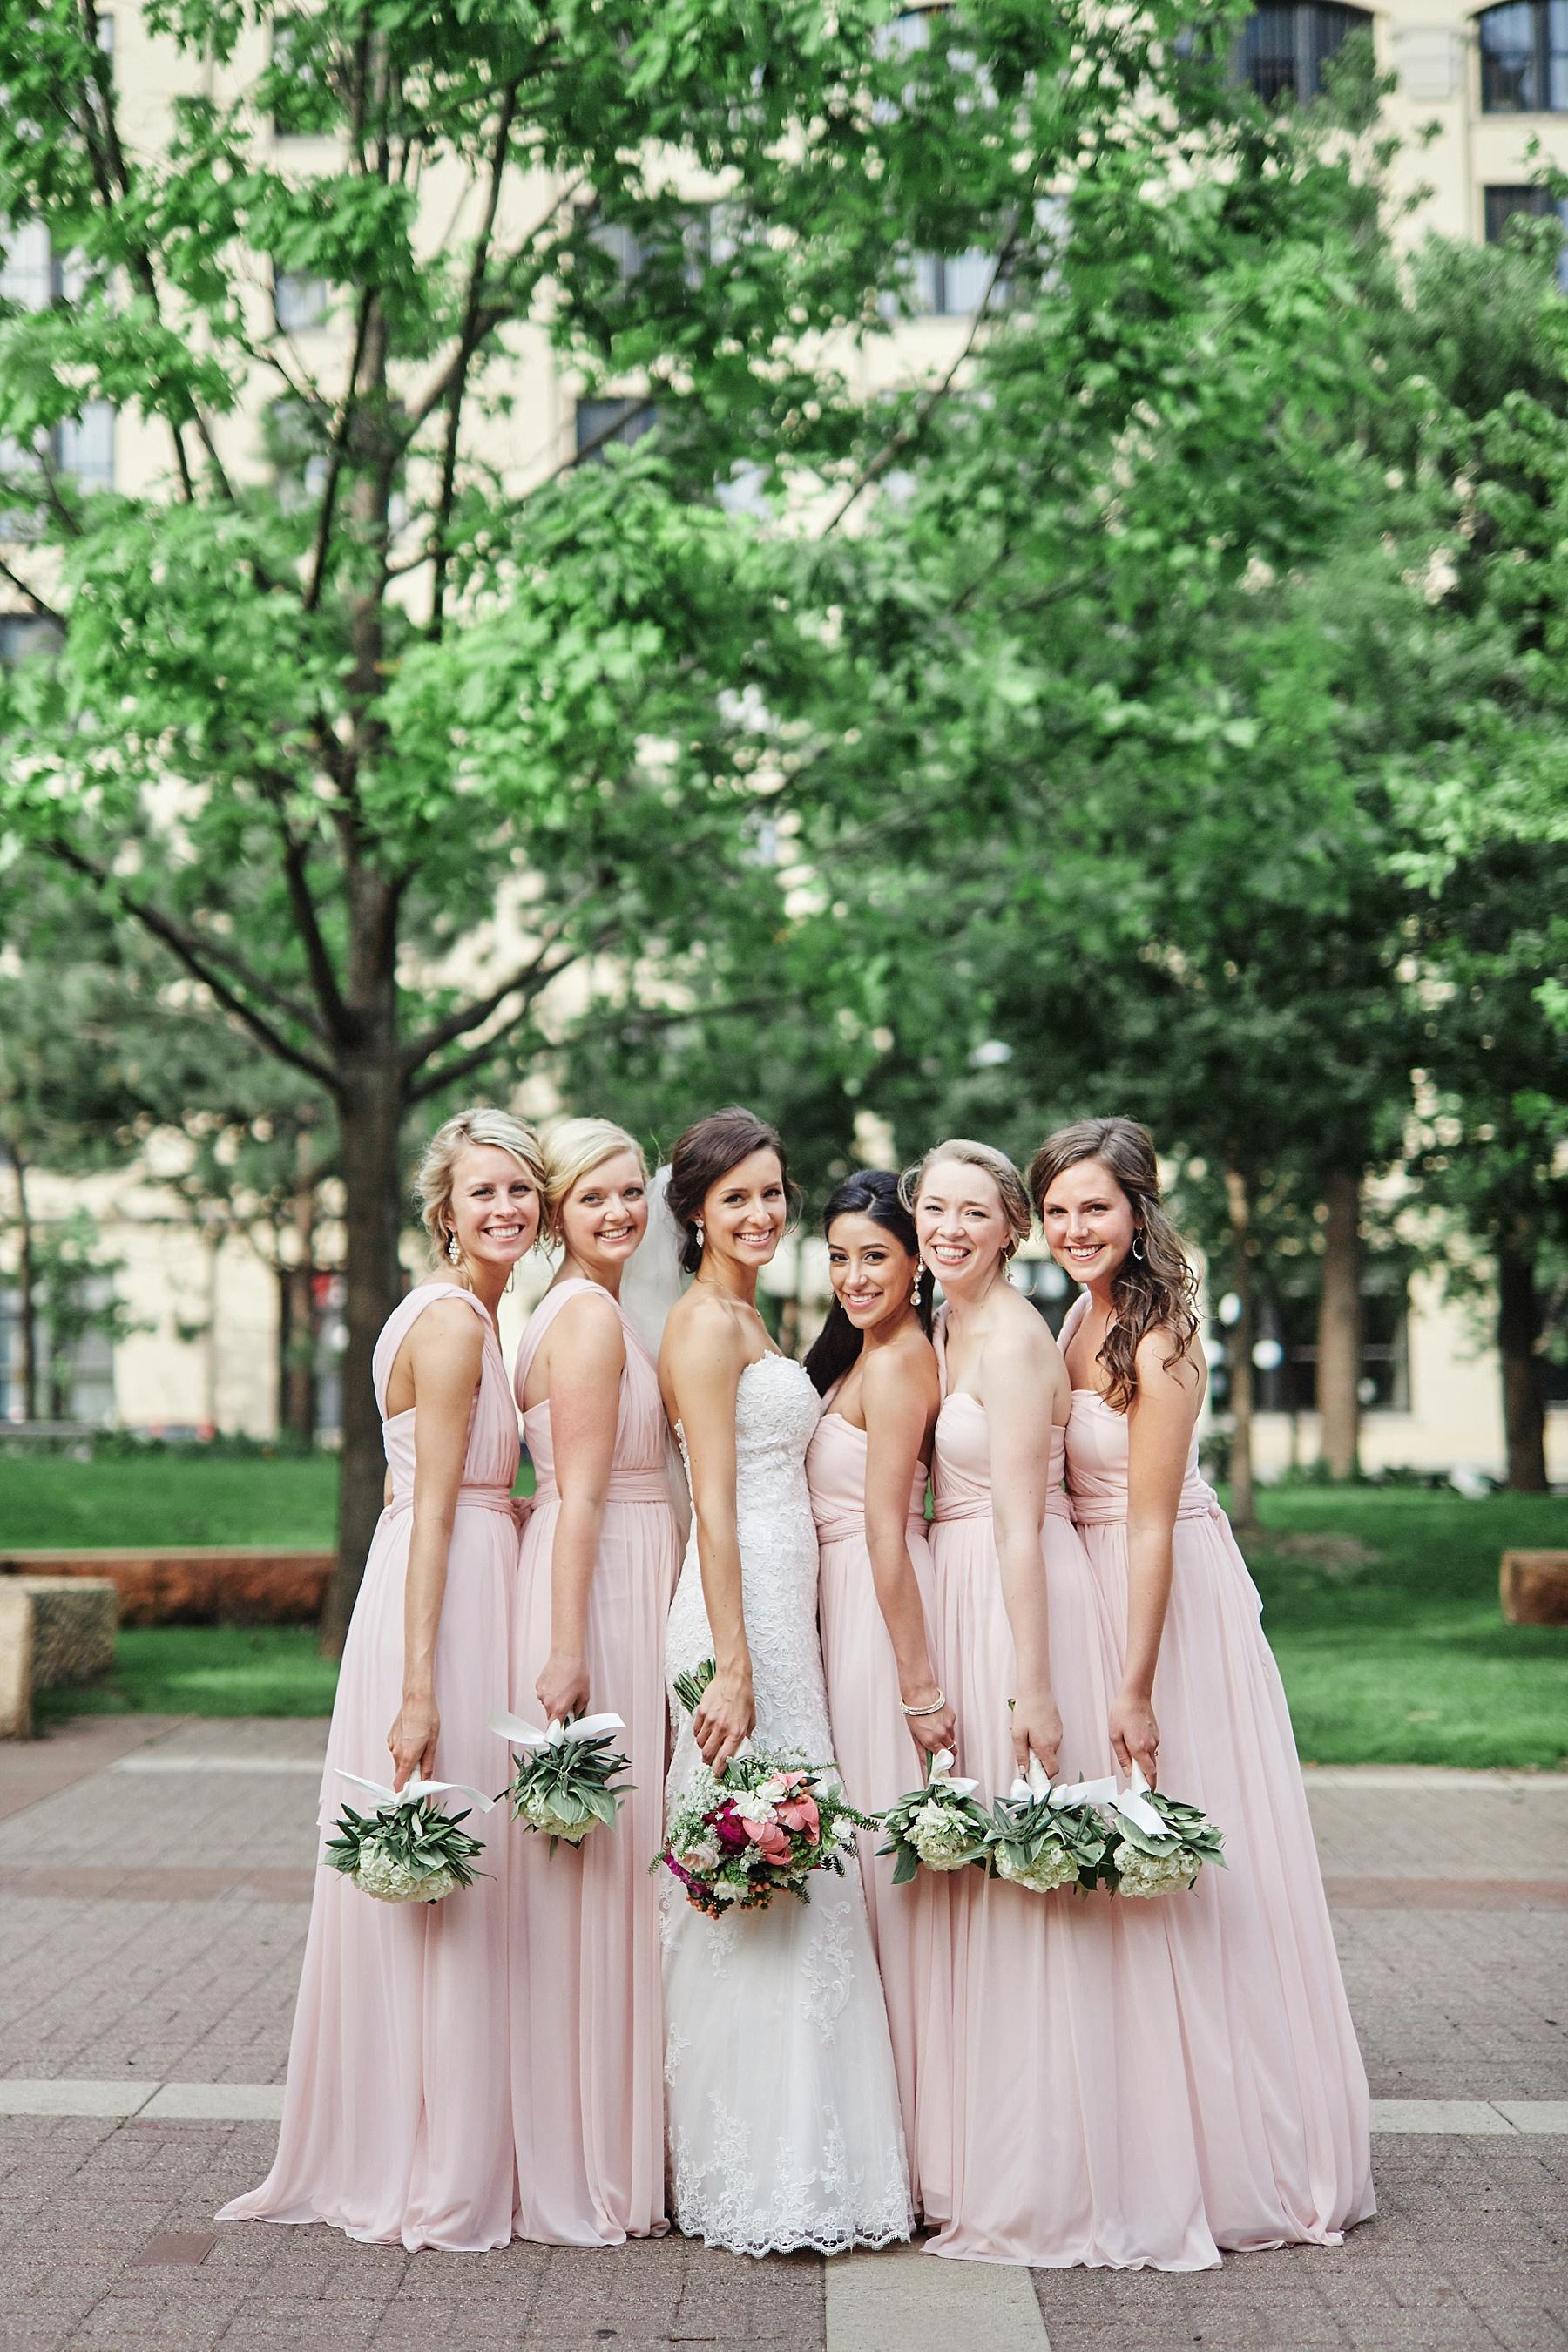 ABULAE-Wedding-Saint-paul-MN-Josh-Sofia-Wedding-Mears-Park_0792.jpg